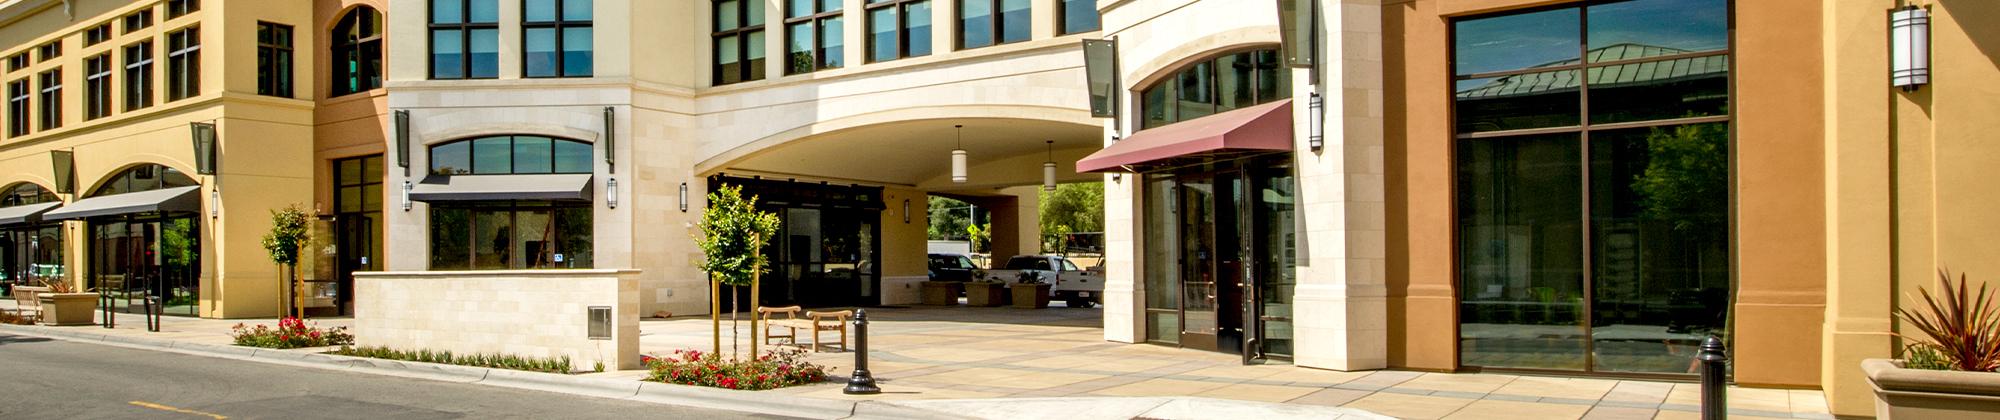 Personal Financial Management Advisors Austin